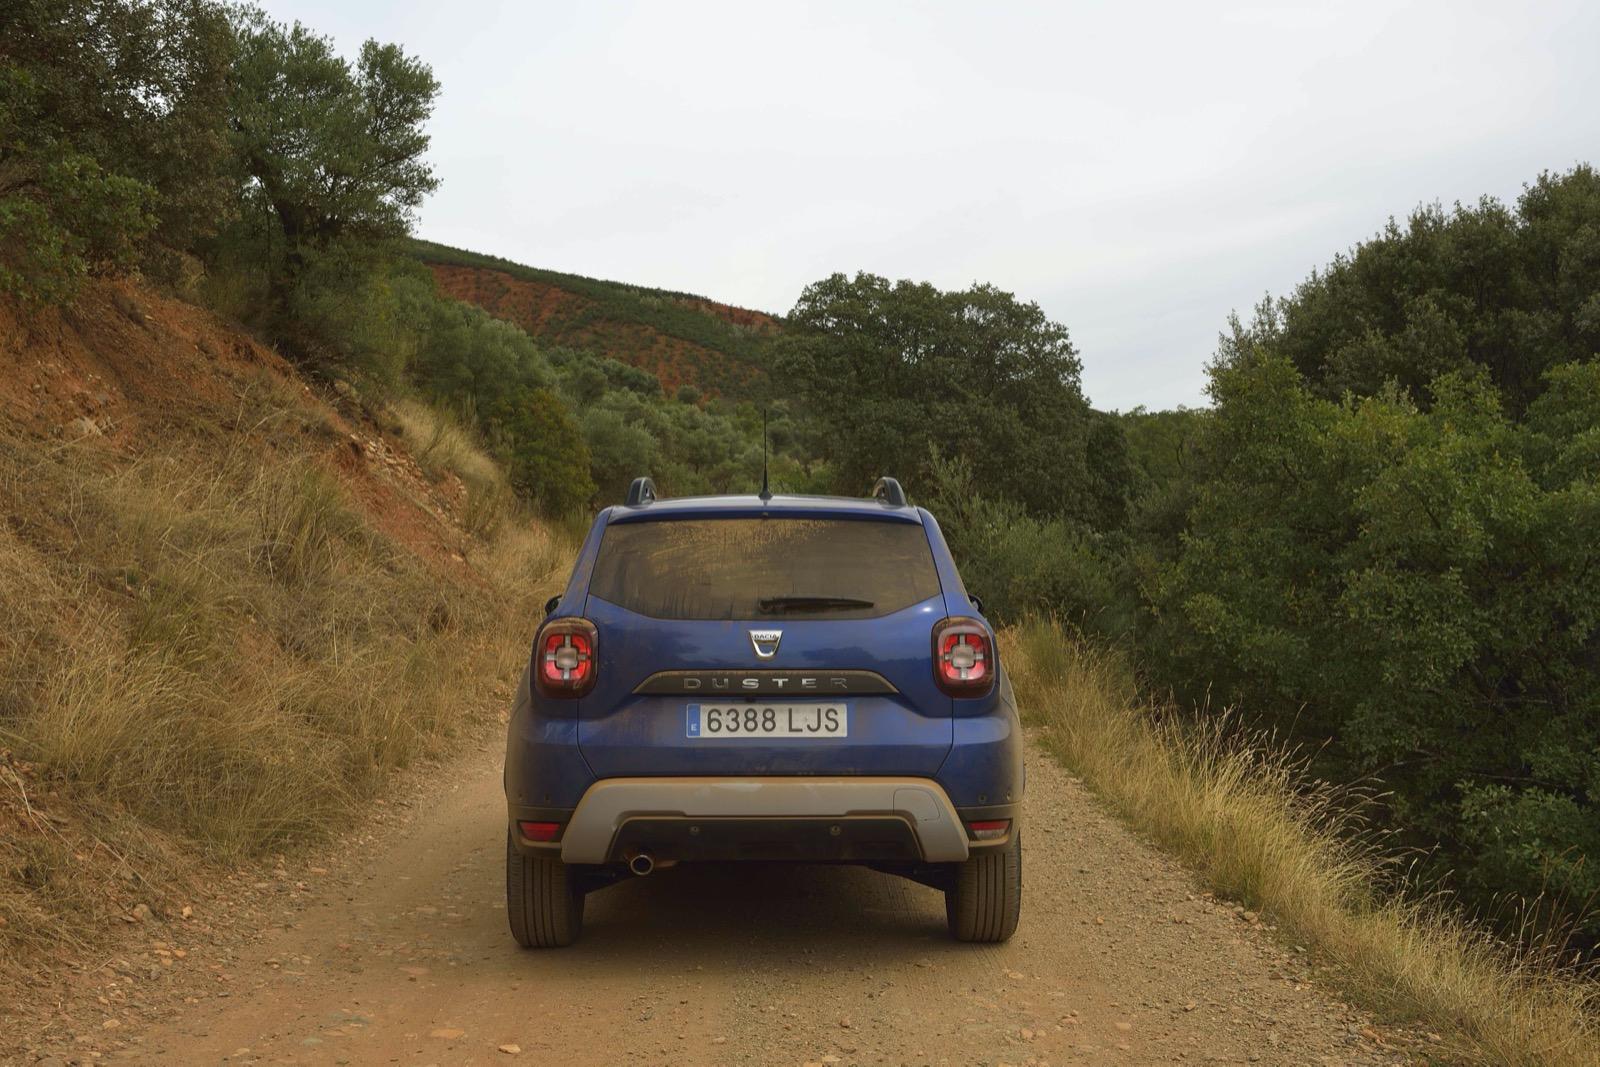 Dacia Duster Glp 7